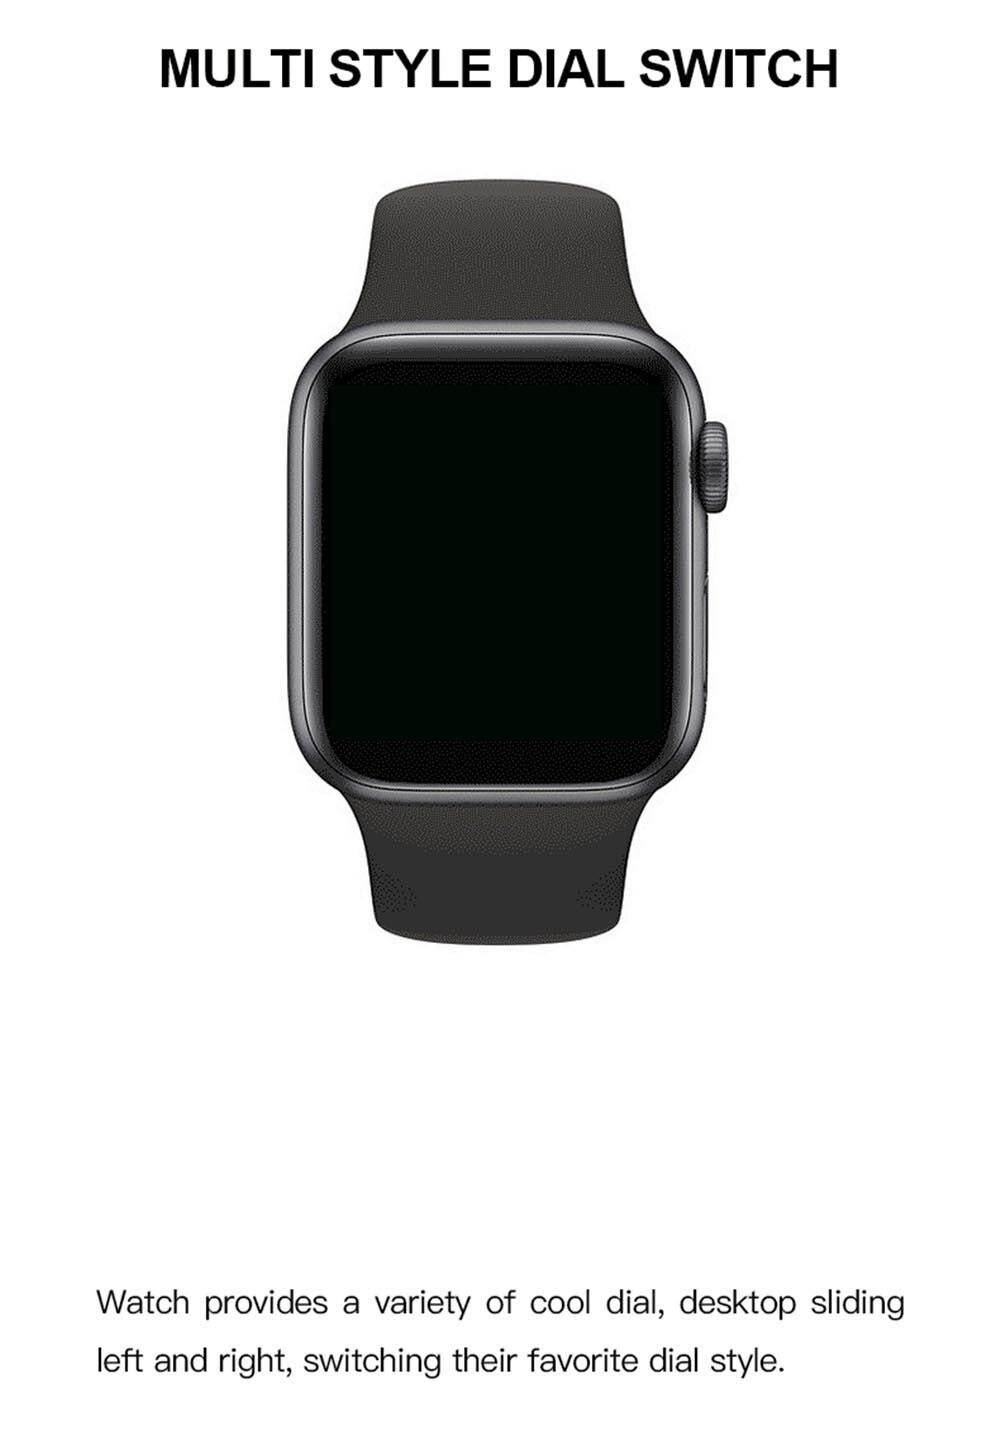 Reloj inteligente T500 PK IWO12 IWO8 T200, reloj inteligente ip67 resistente al agua con Bluetooth, llamadas, música, juego, Serie 5